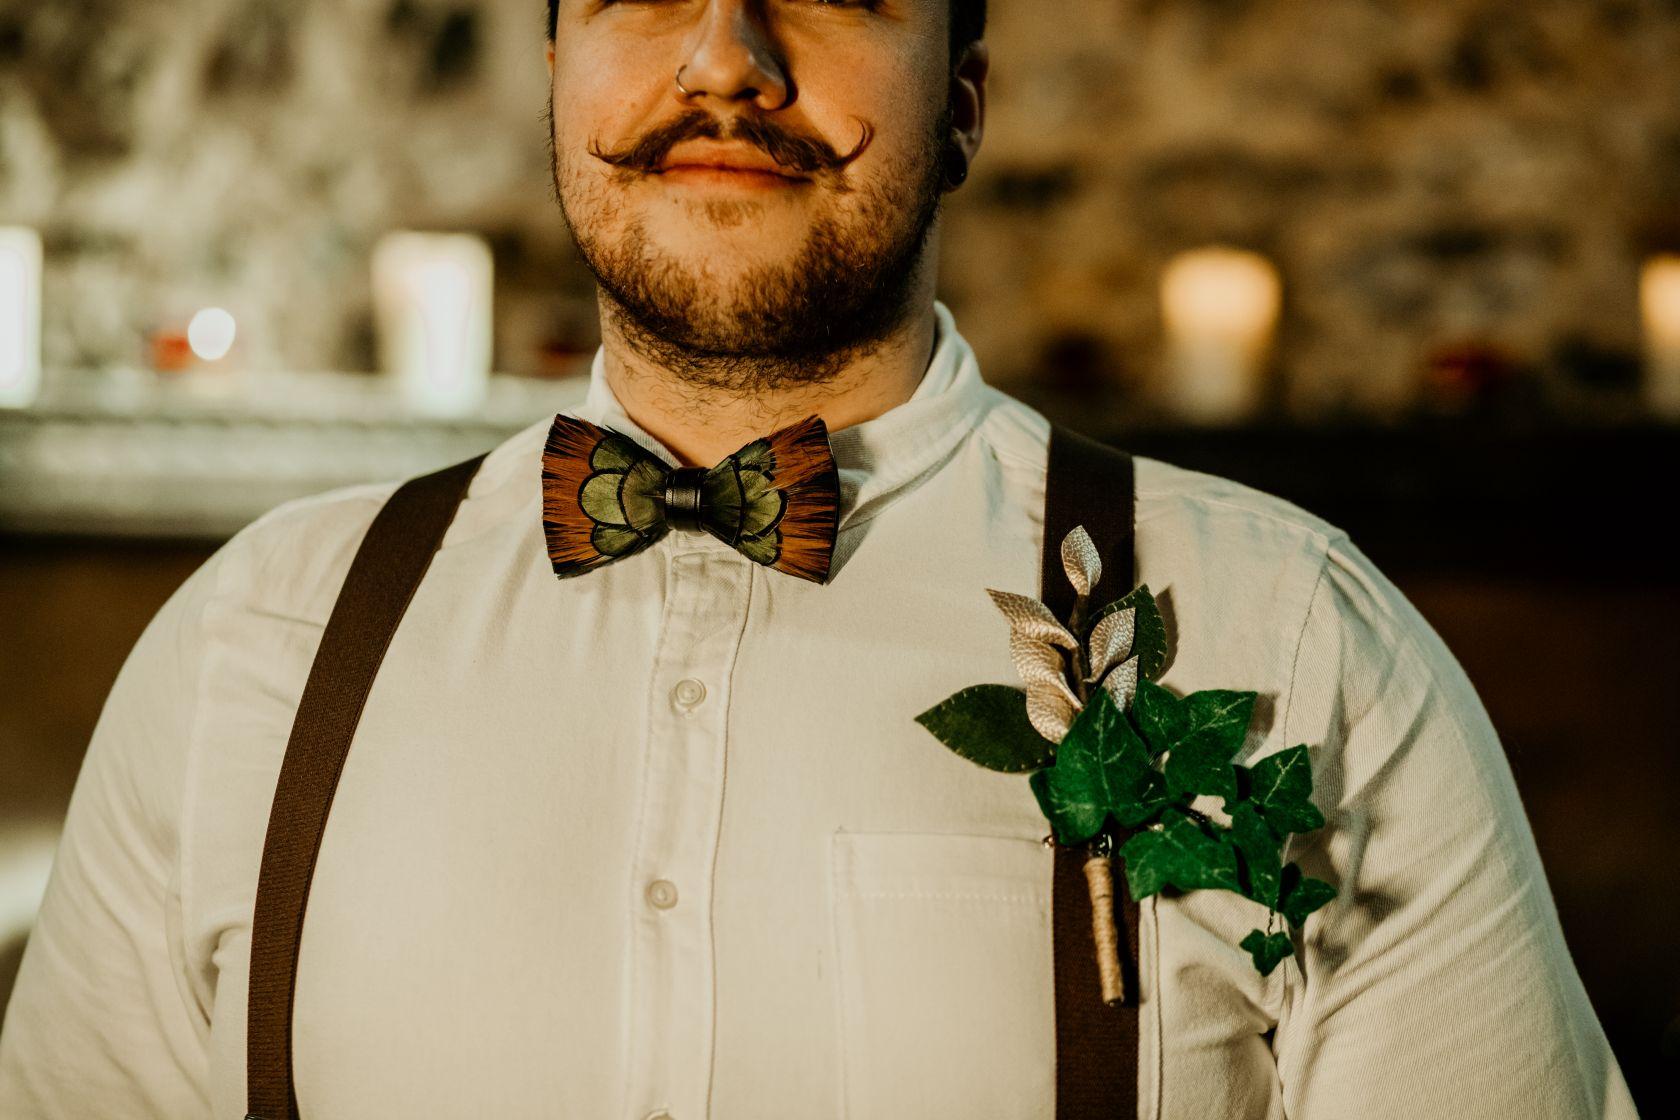 alternative fairytale wedding- snow white wedding- charlotte laurie designs-chloe mary photo- unconventional wedding- alternative wedding inspiration- feather bow tie